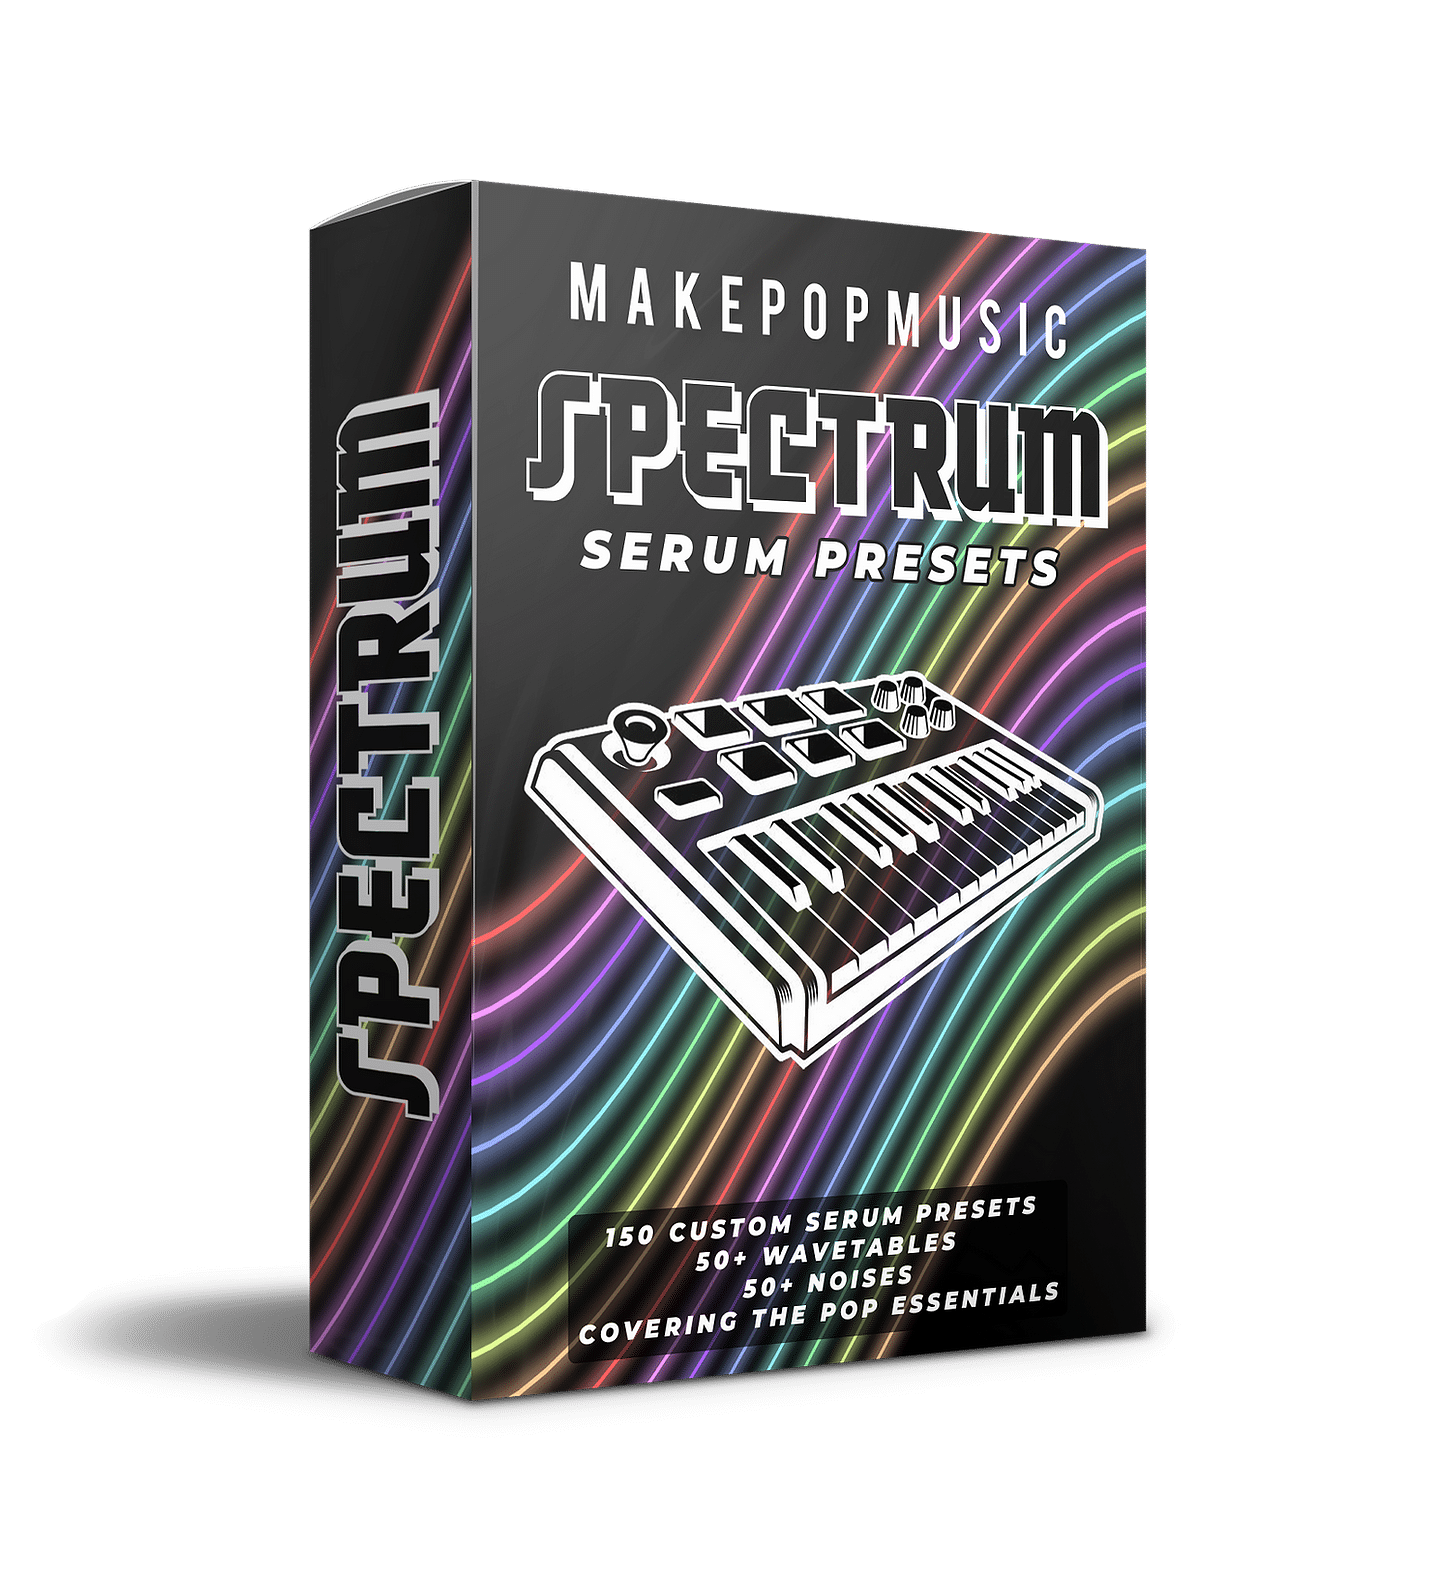 Make Pop Music - Spectrum (Serum Presets)